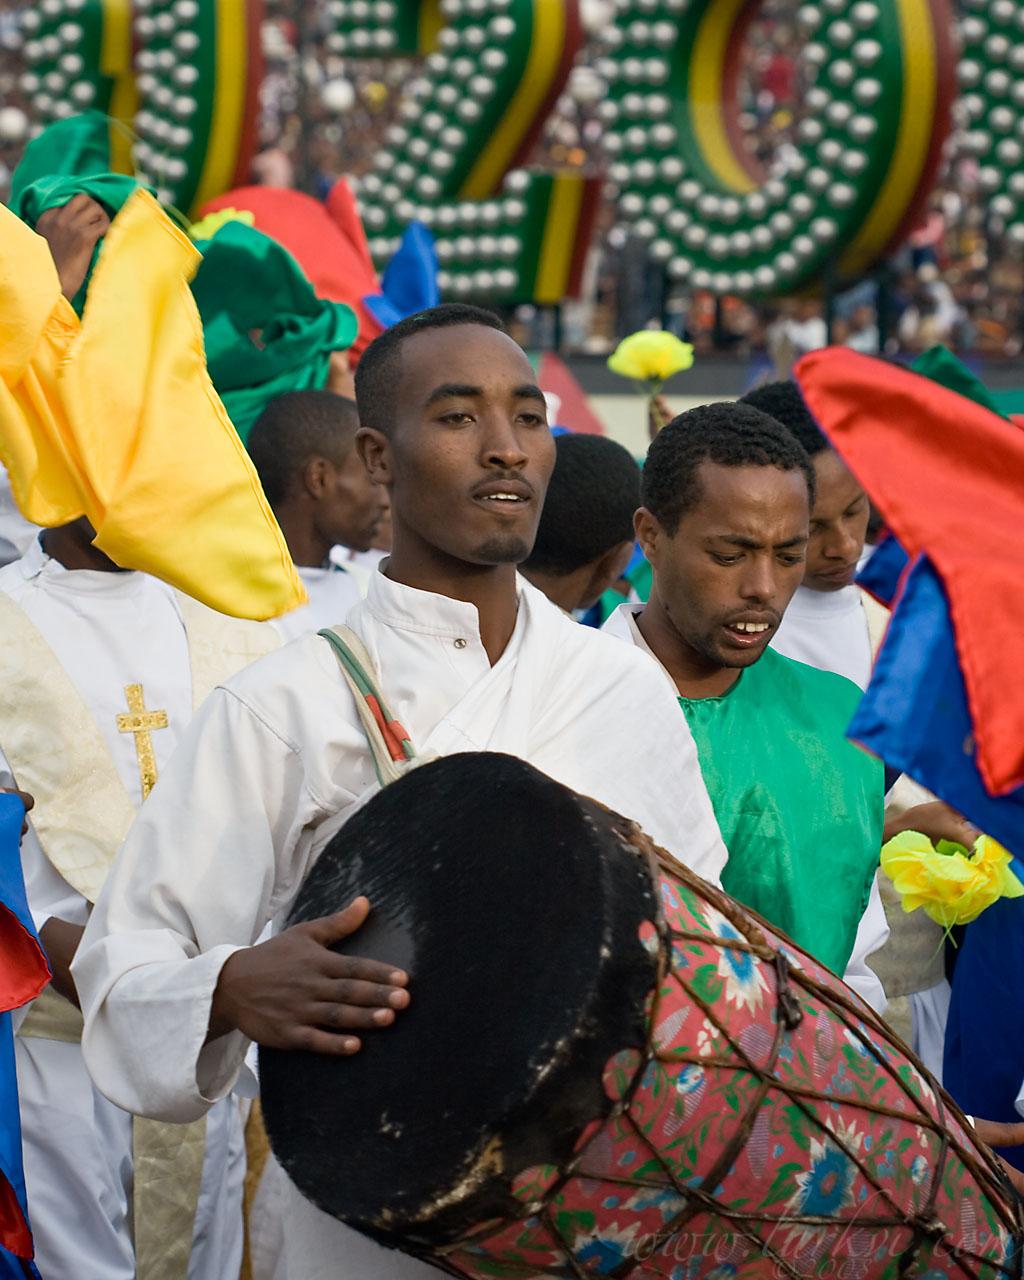 Drummer, Meskel, Addis Ababa, Ethiopia, 2008